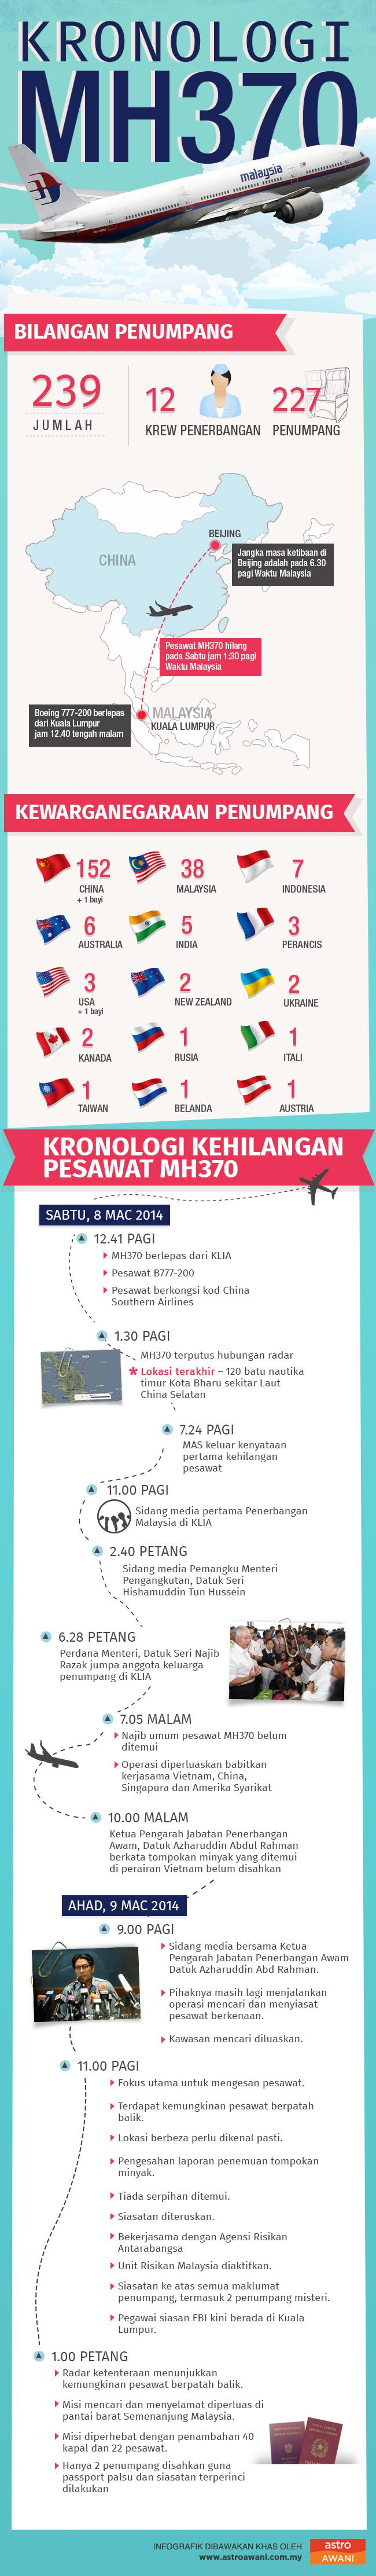 Selasa MH370 Kronologi